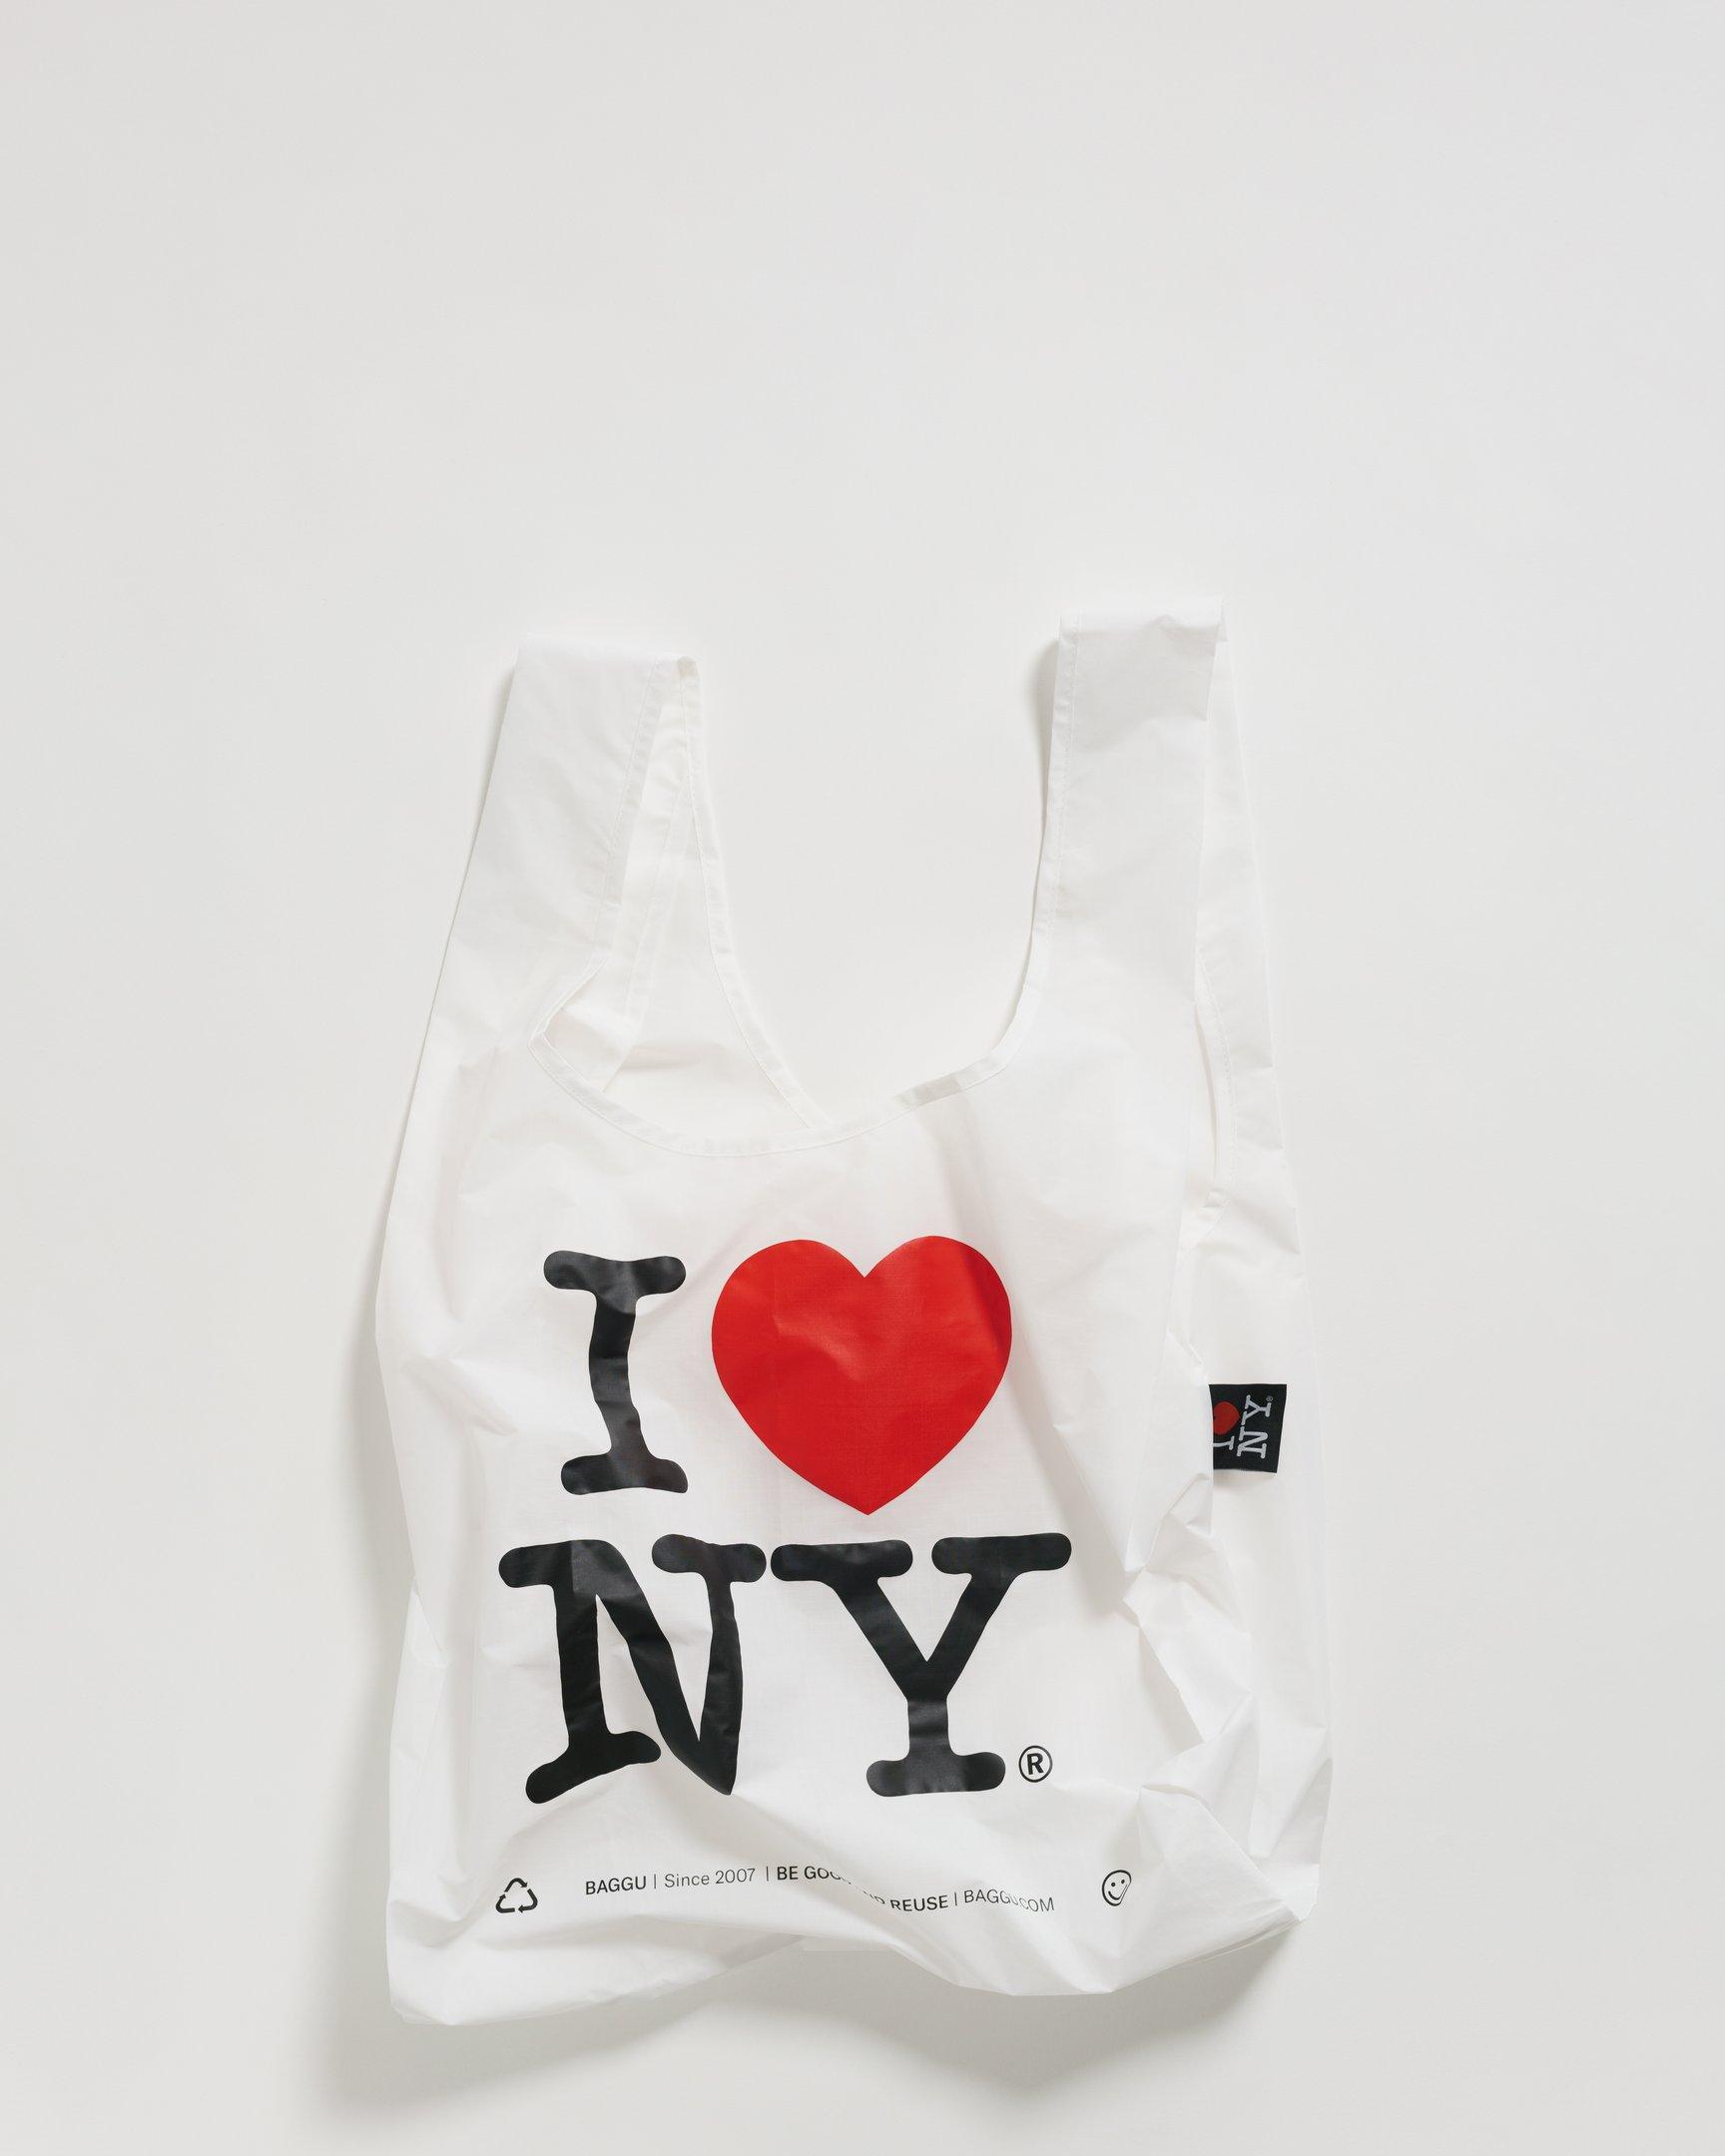 BAGGU Einkaufsbeutel I Love NY